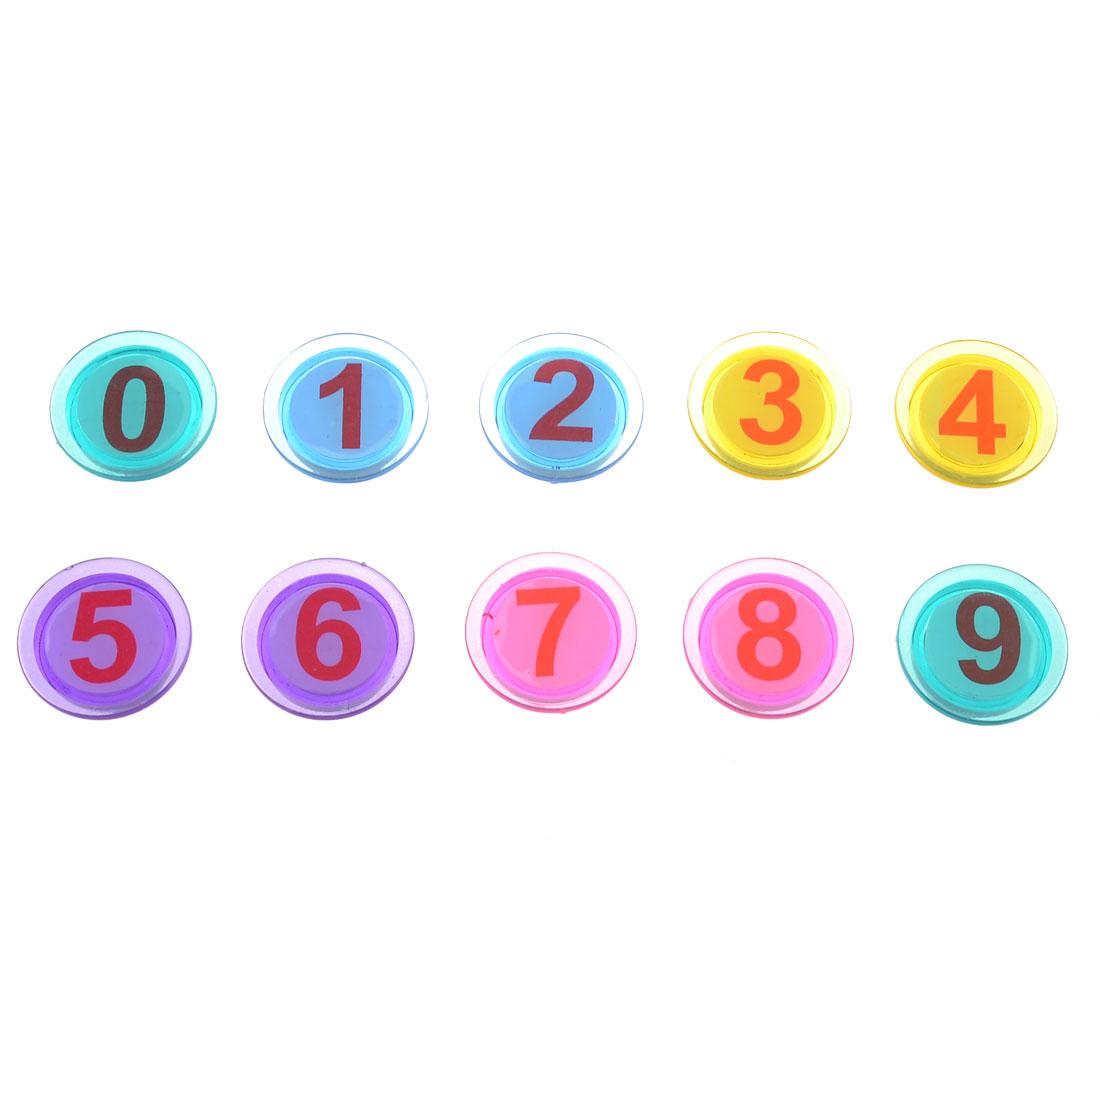 10 Pcs Multicolor 30mm Dia 0-9 Arabic Number Round Refrigerator Fridge Magnets